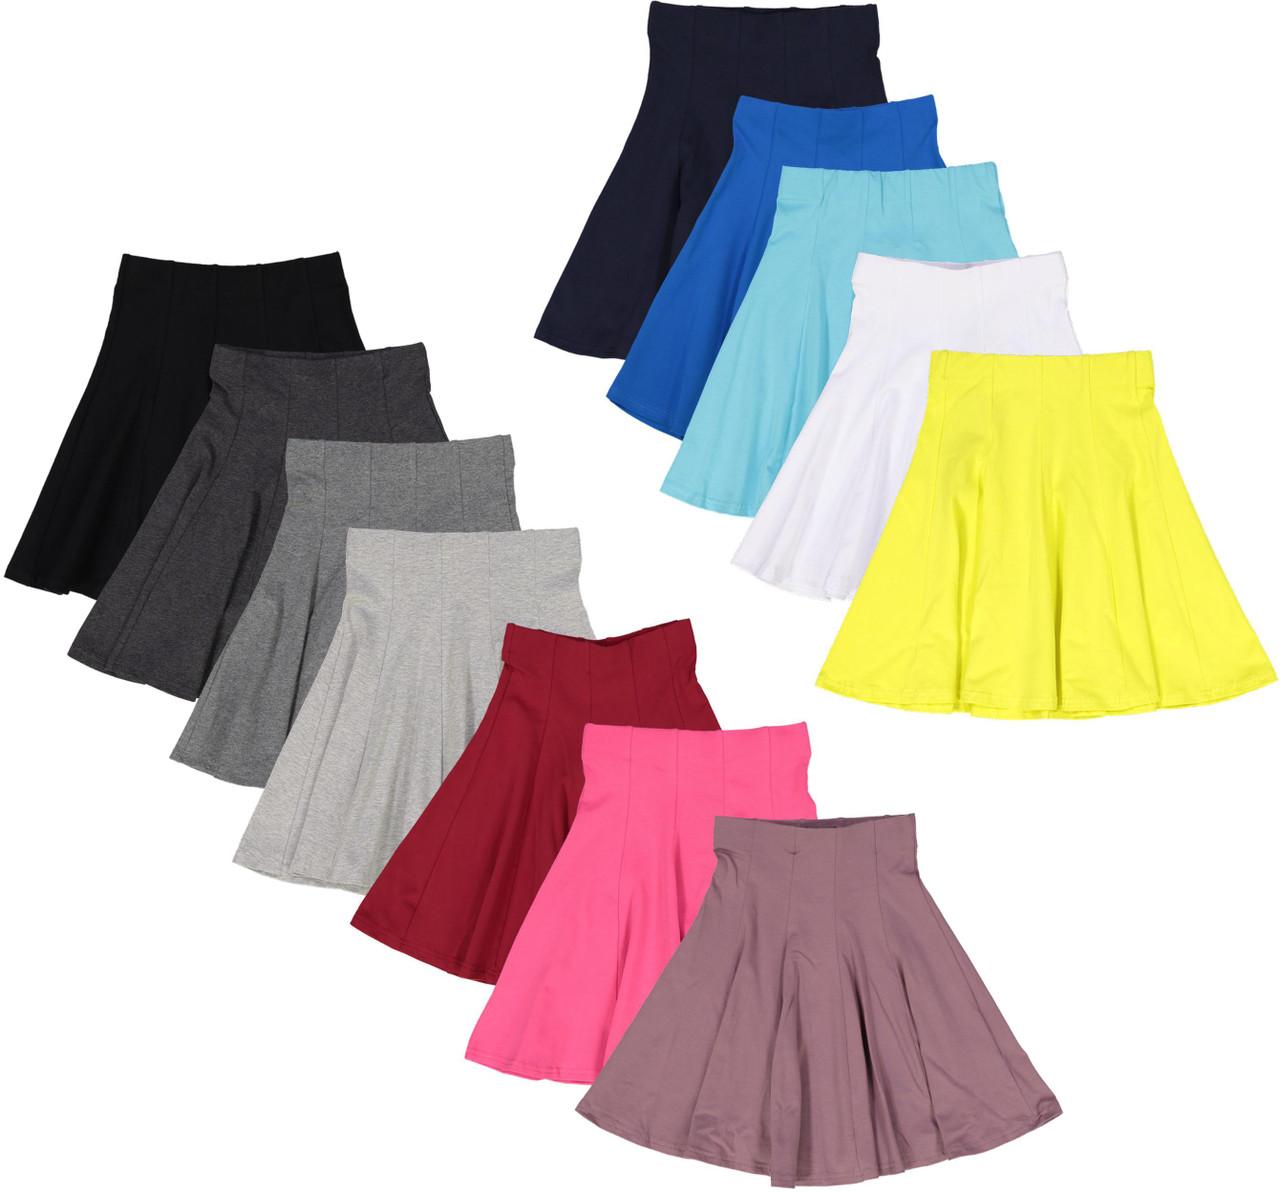 Skirts for girls, girls skirts, fashion skirts for girls,summer girls skirts,panel  skirts, skirts with elastic waistband